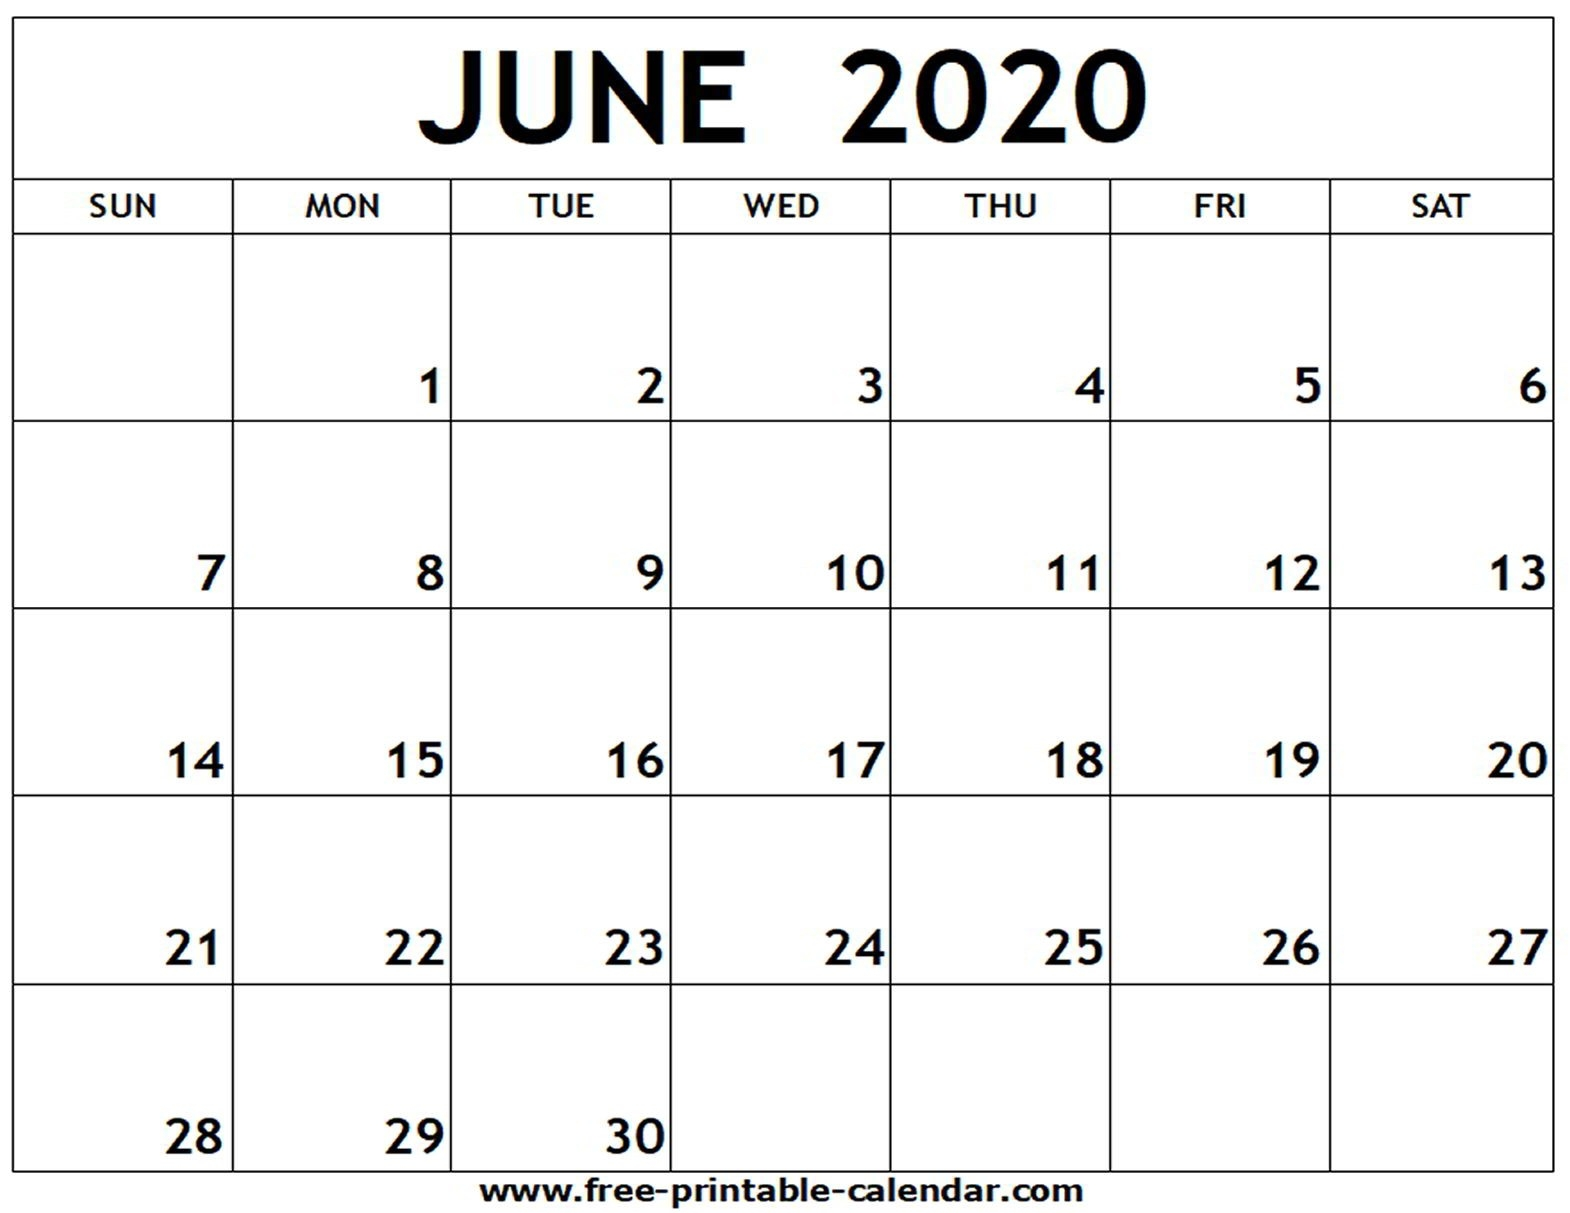 June 2020 Printable Calendar - Free-Printable-Calendar-Blank June Calendar Template 2020